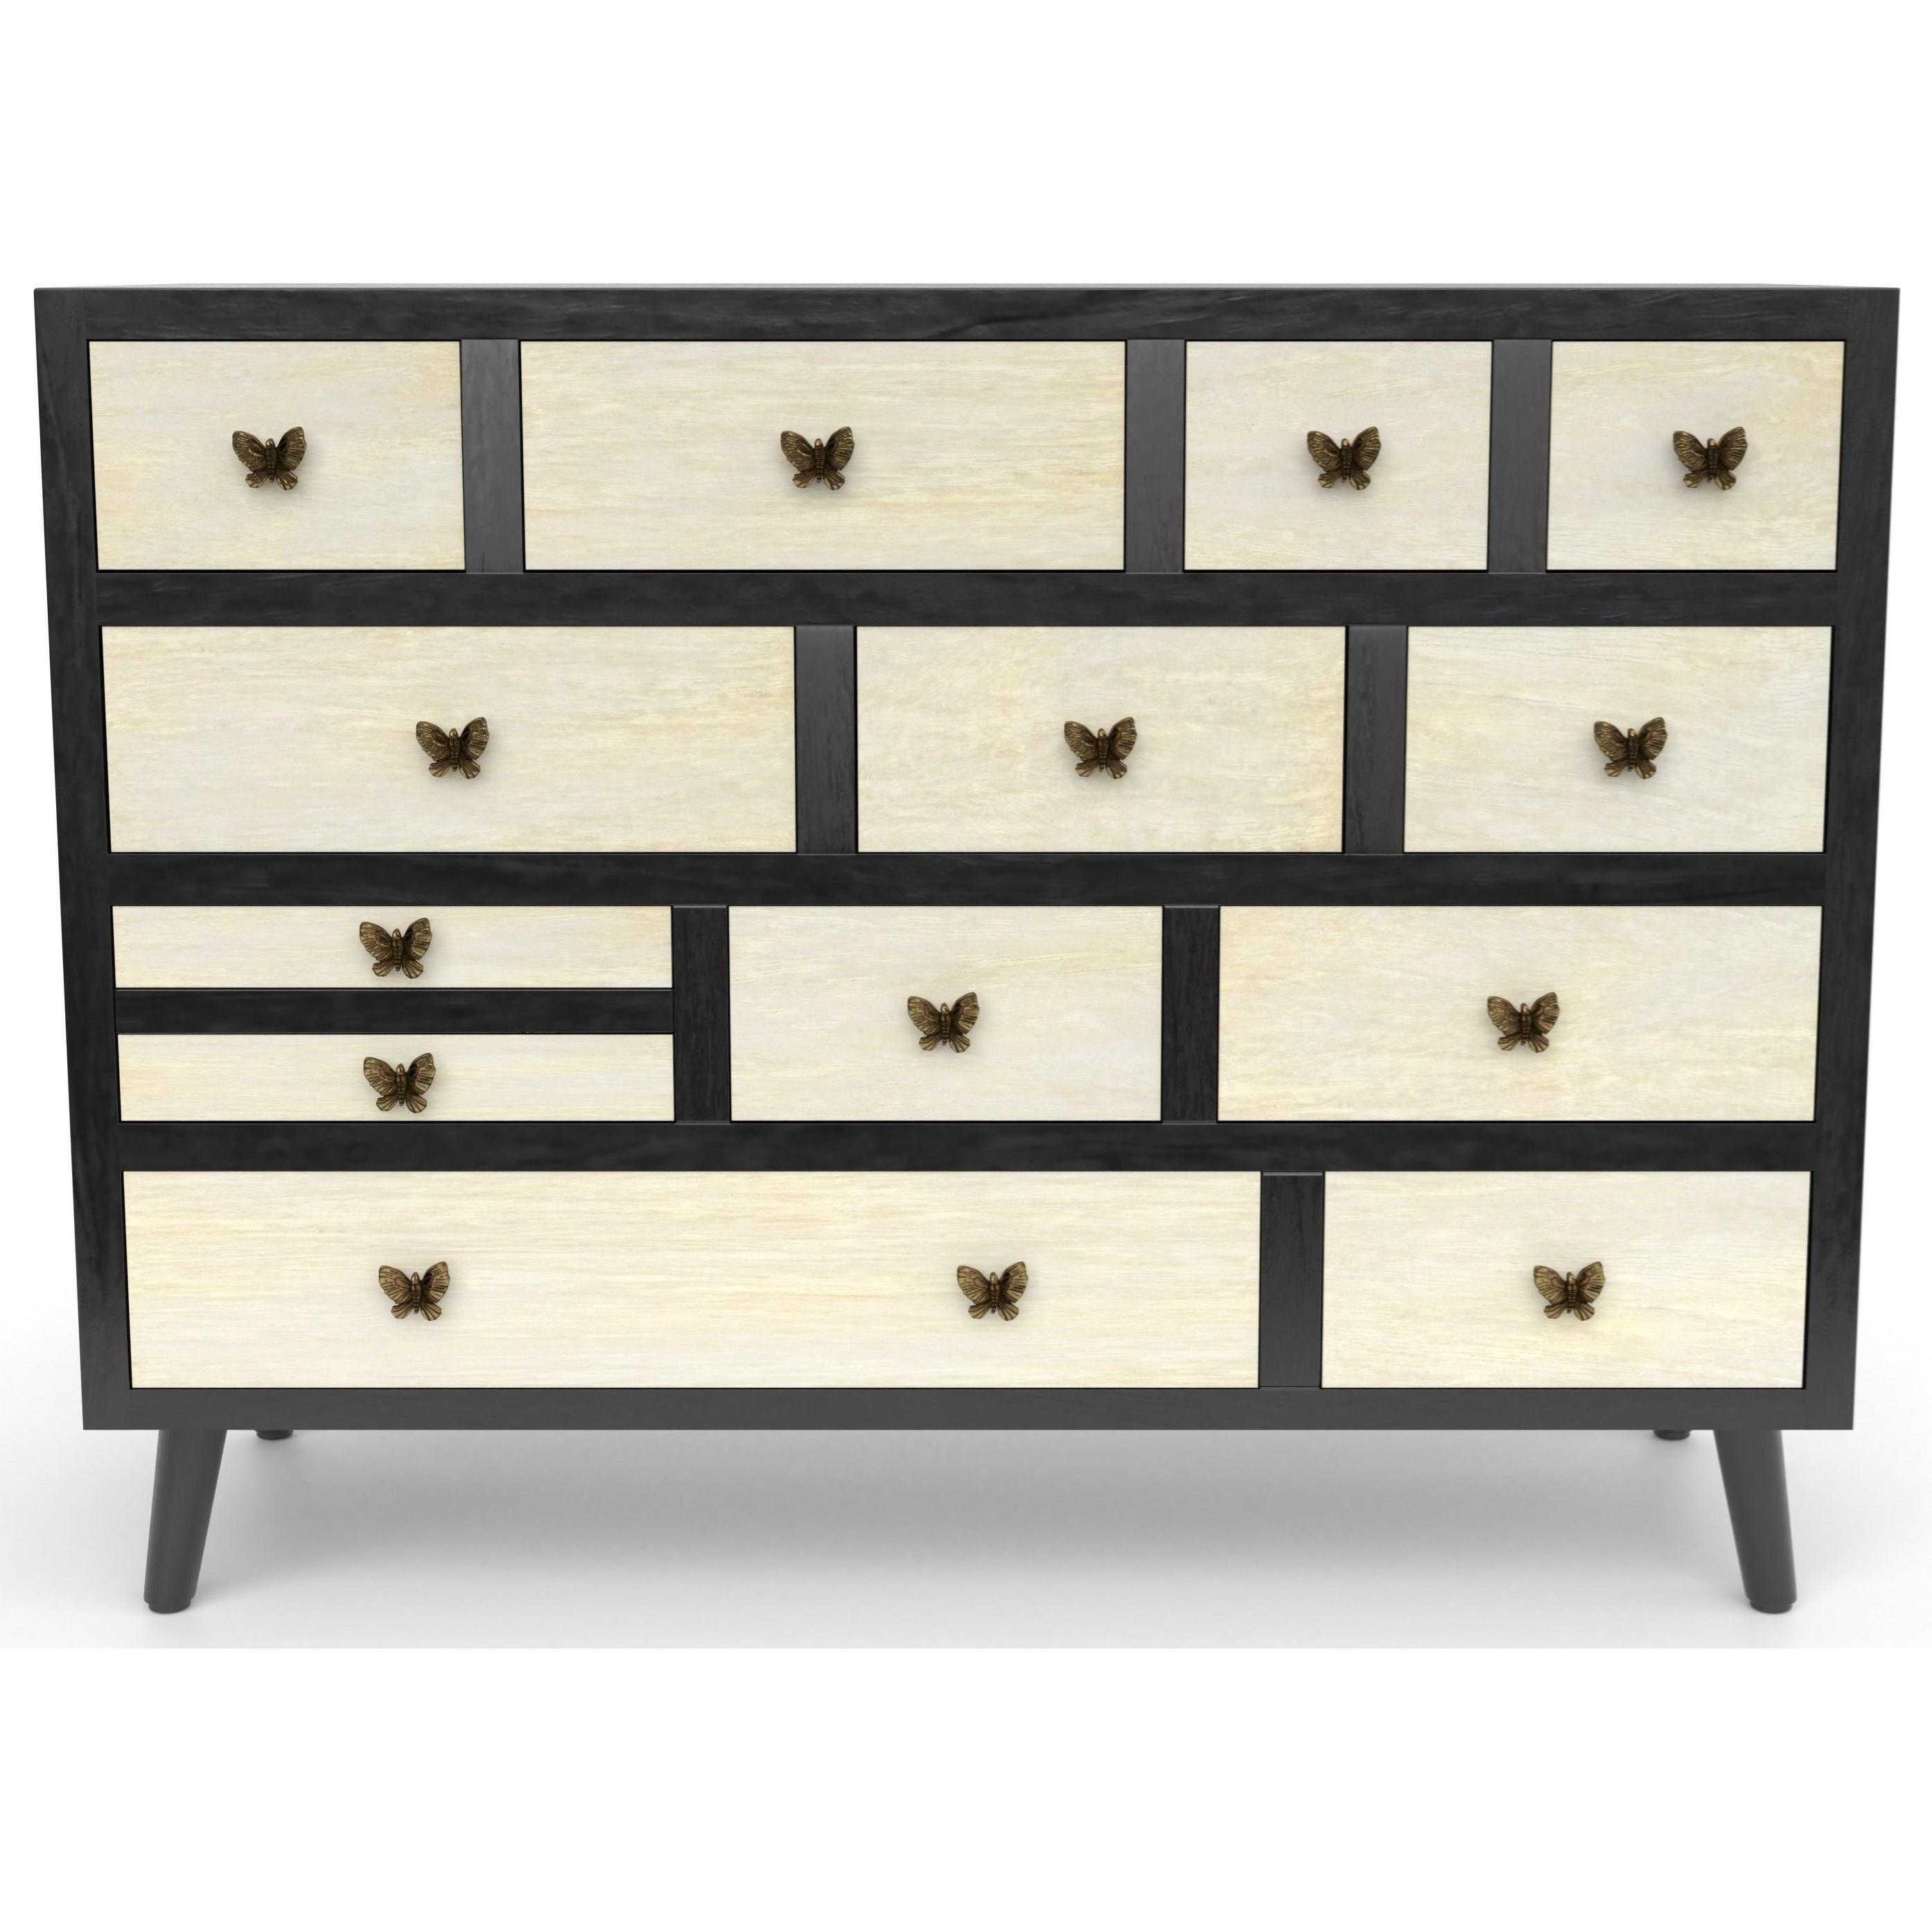 Papillon 13 Drawer Sideboard by Steve Silver at Walker's Furniture